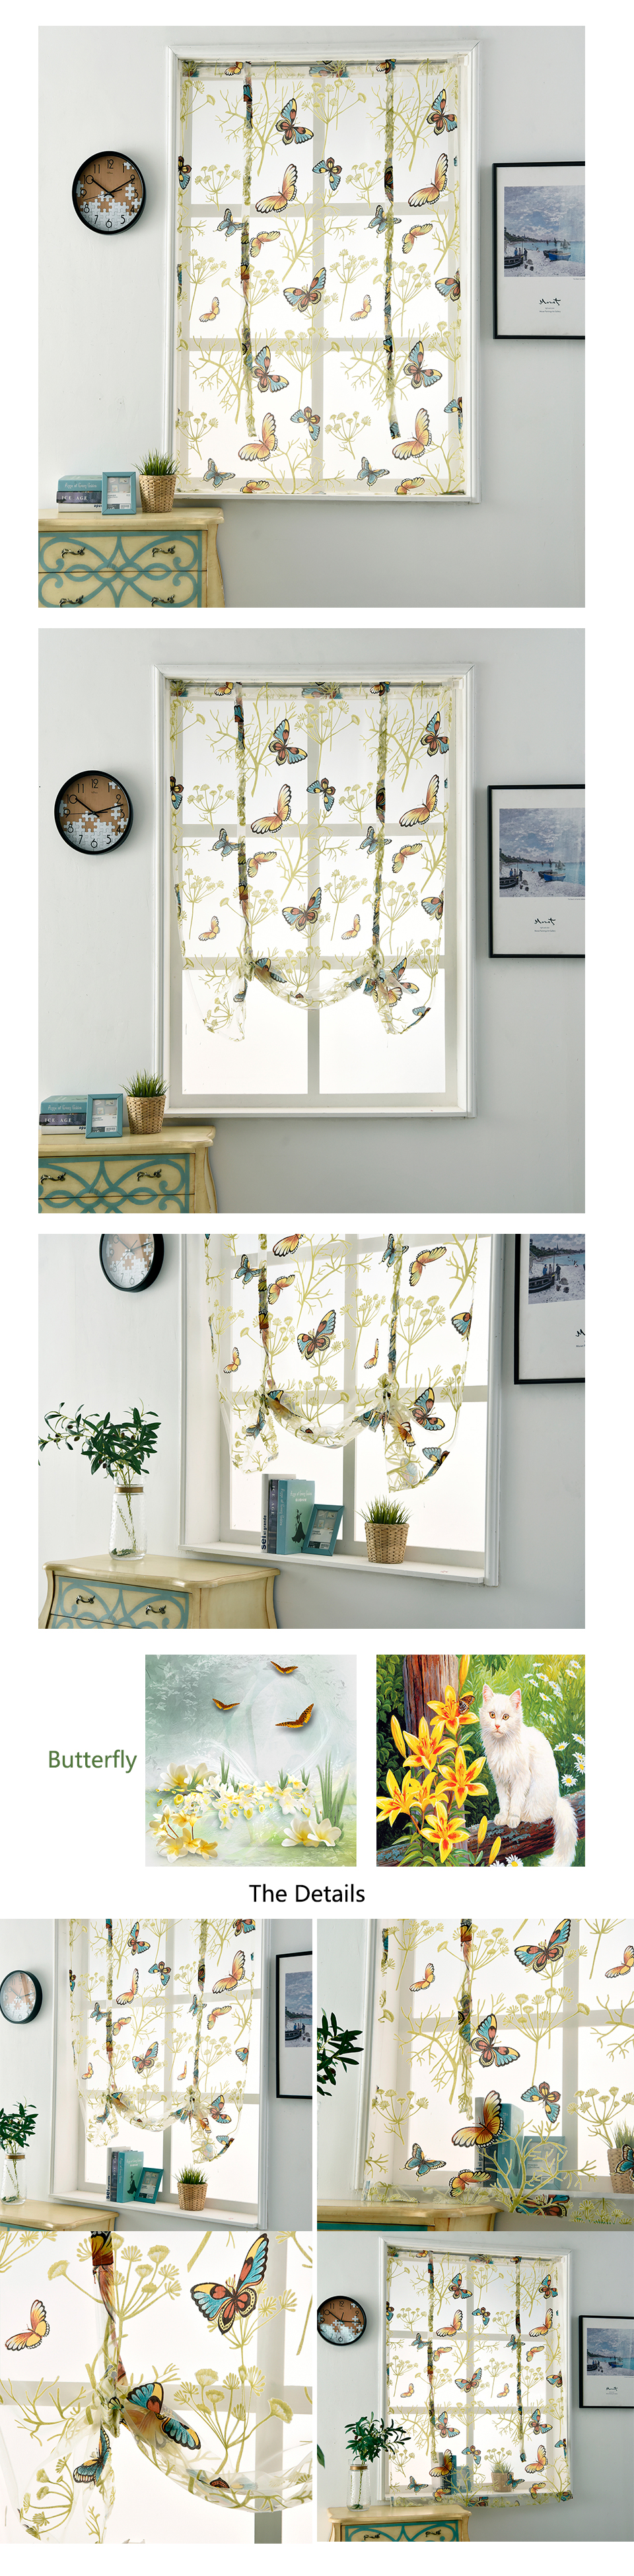 Sinogem Kitchen short sheer curtains burnout roman blinds butterfly sheer panel tulle window treatment door curtains home decor (6)